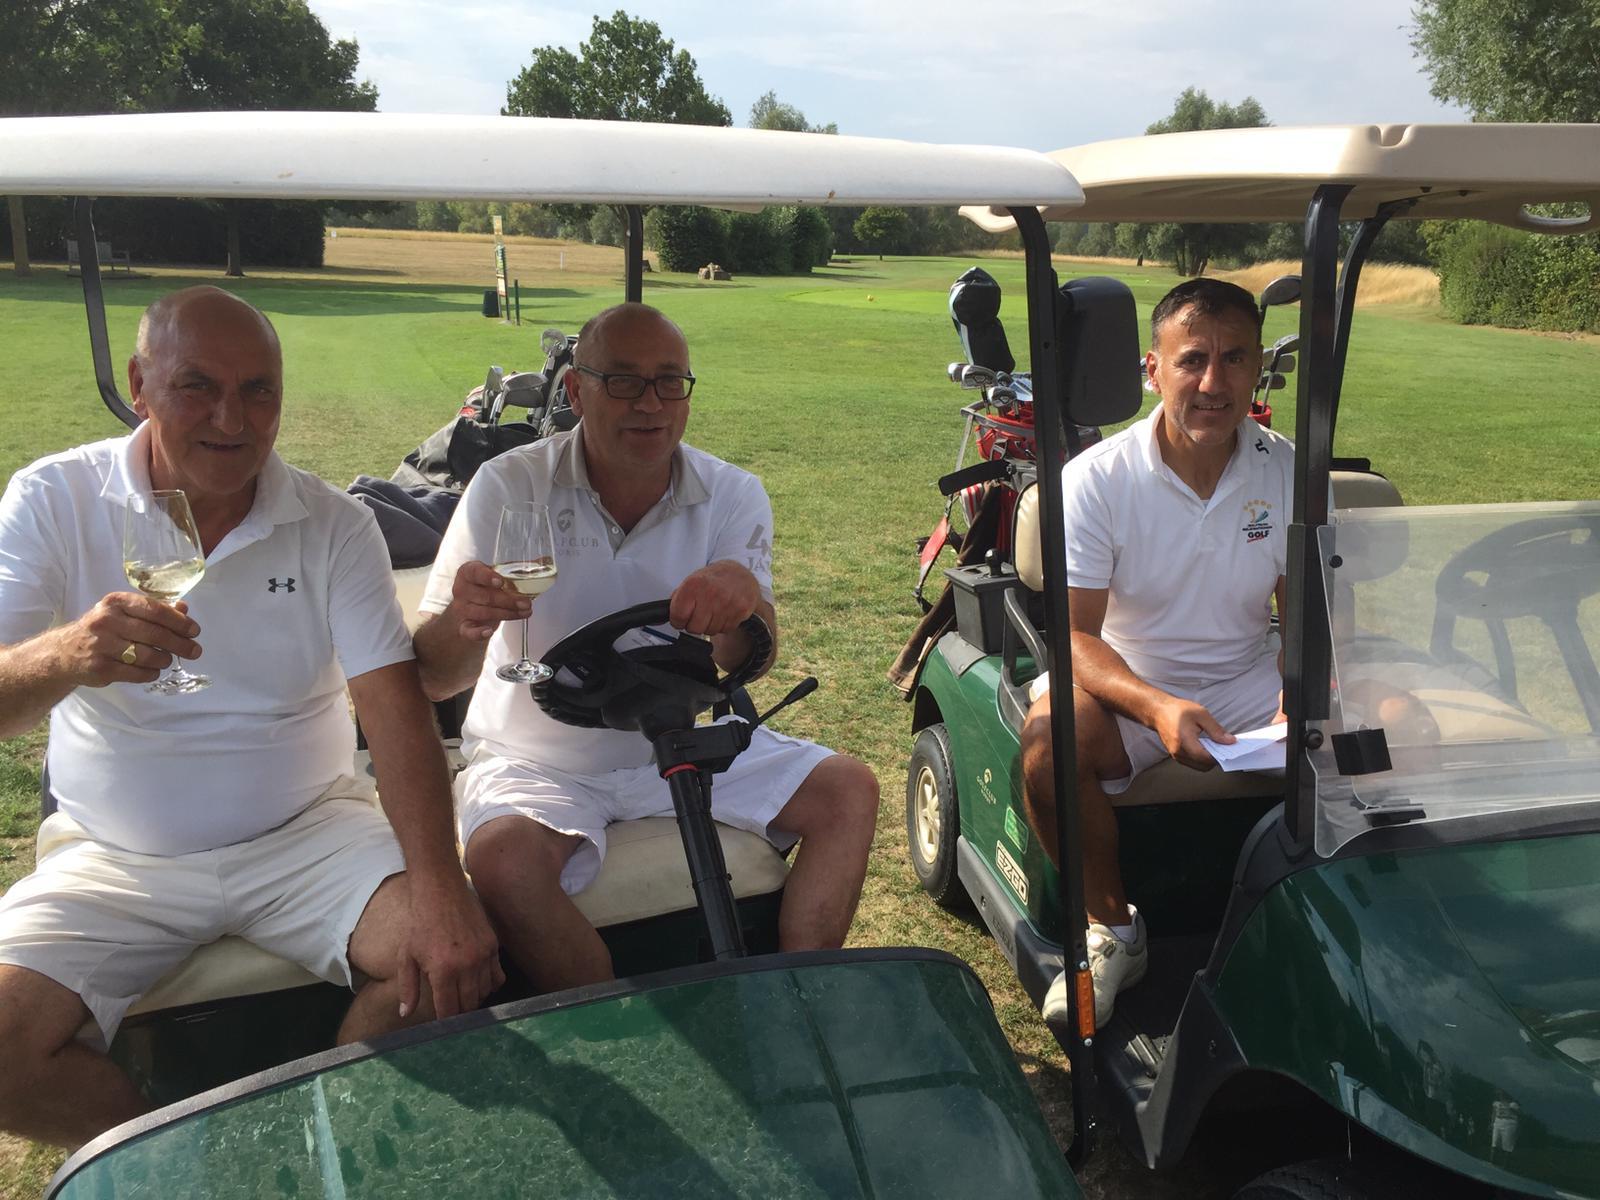 34_Golfturnier_Soroptimist_Golf_en_blanc